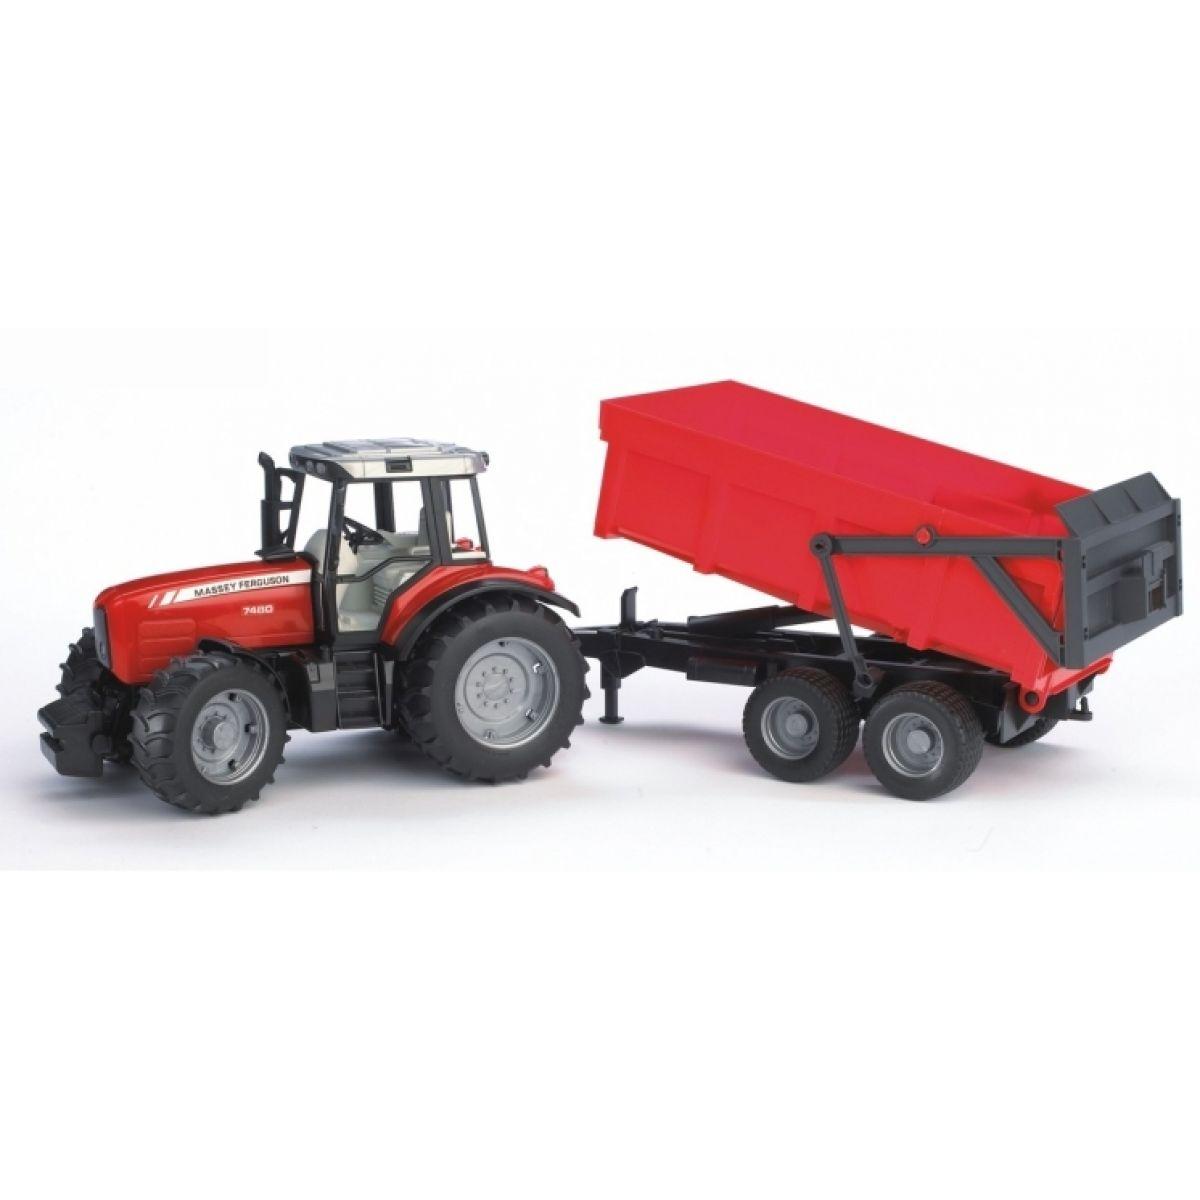 Bruder Traktor 2045 MASSEY FERGUSON + sklopné vozidlo červené